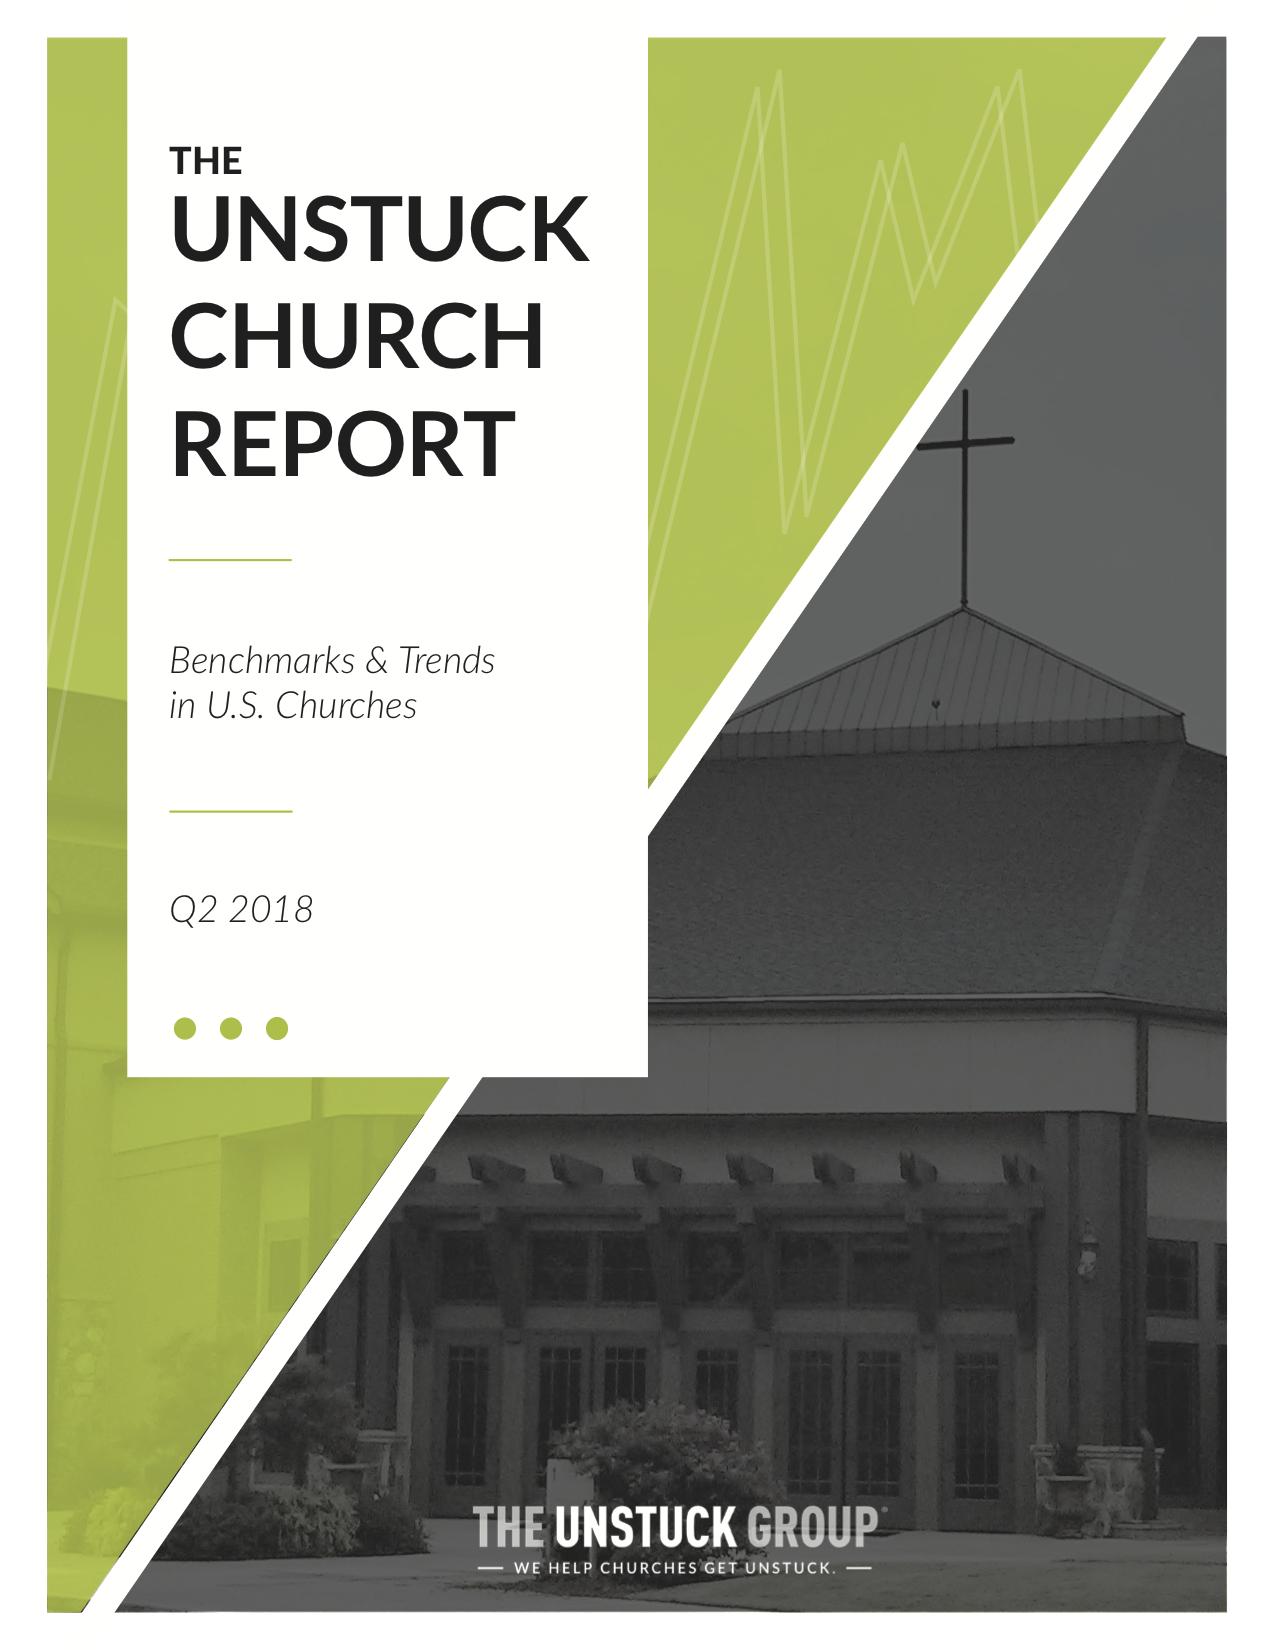 UnstuckChurchReport_cover-1